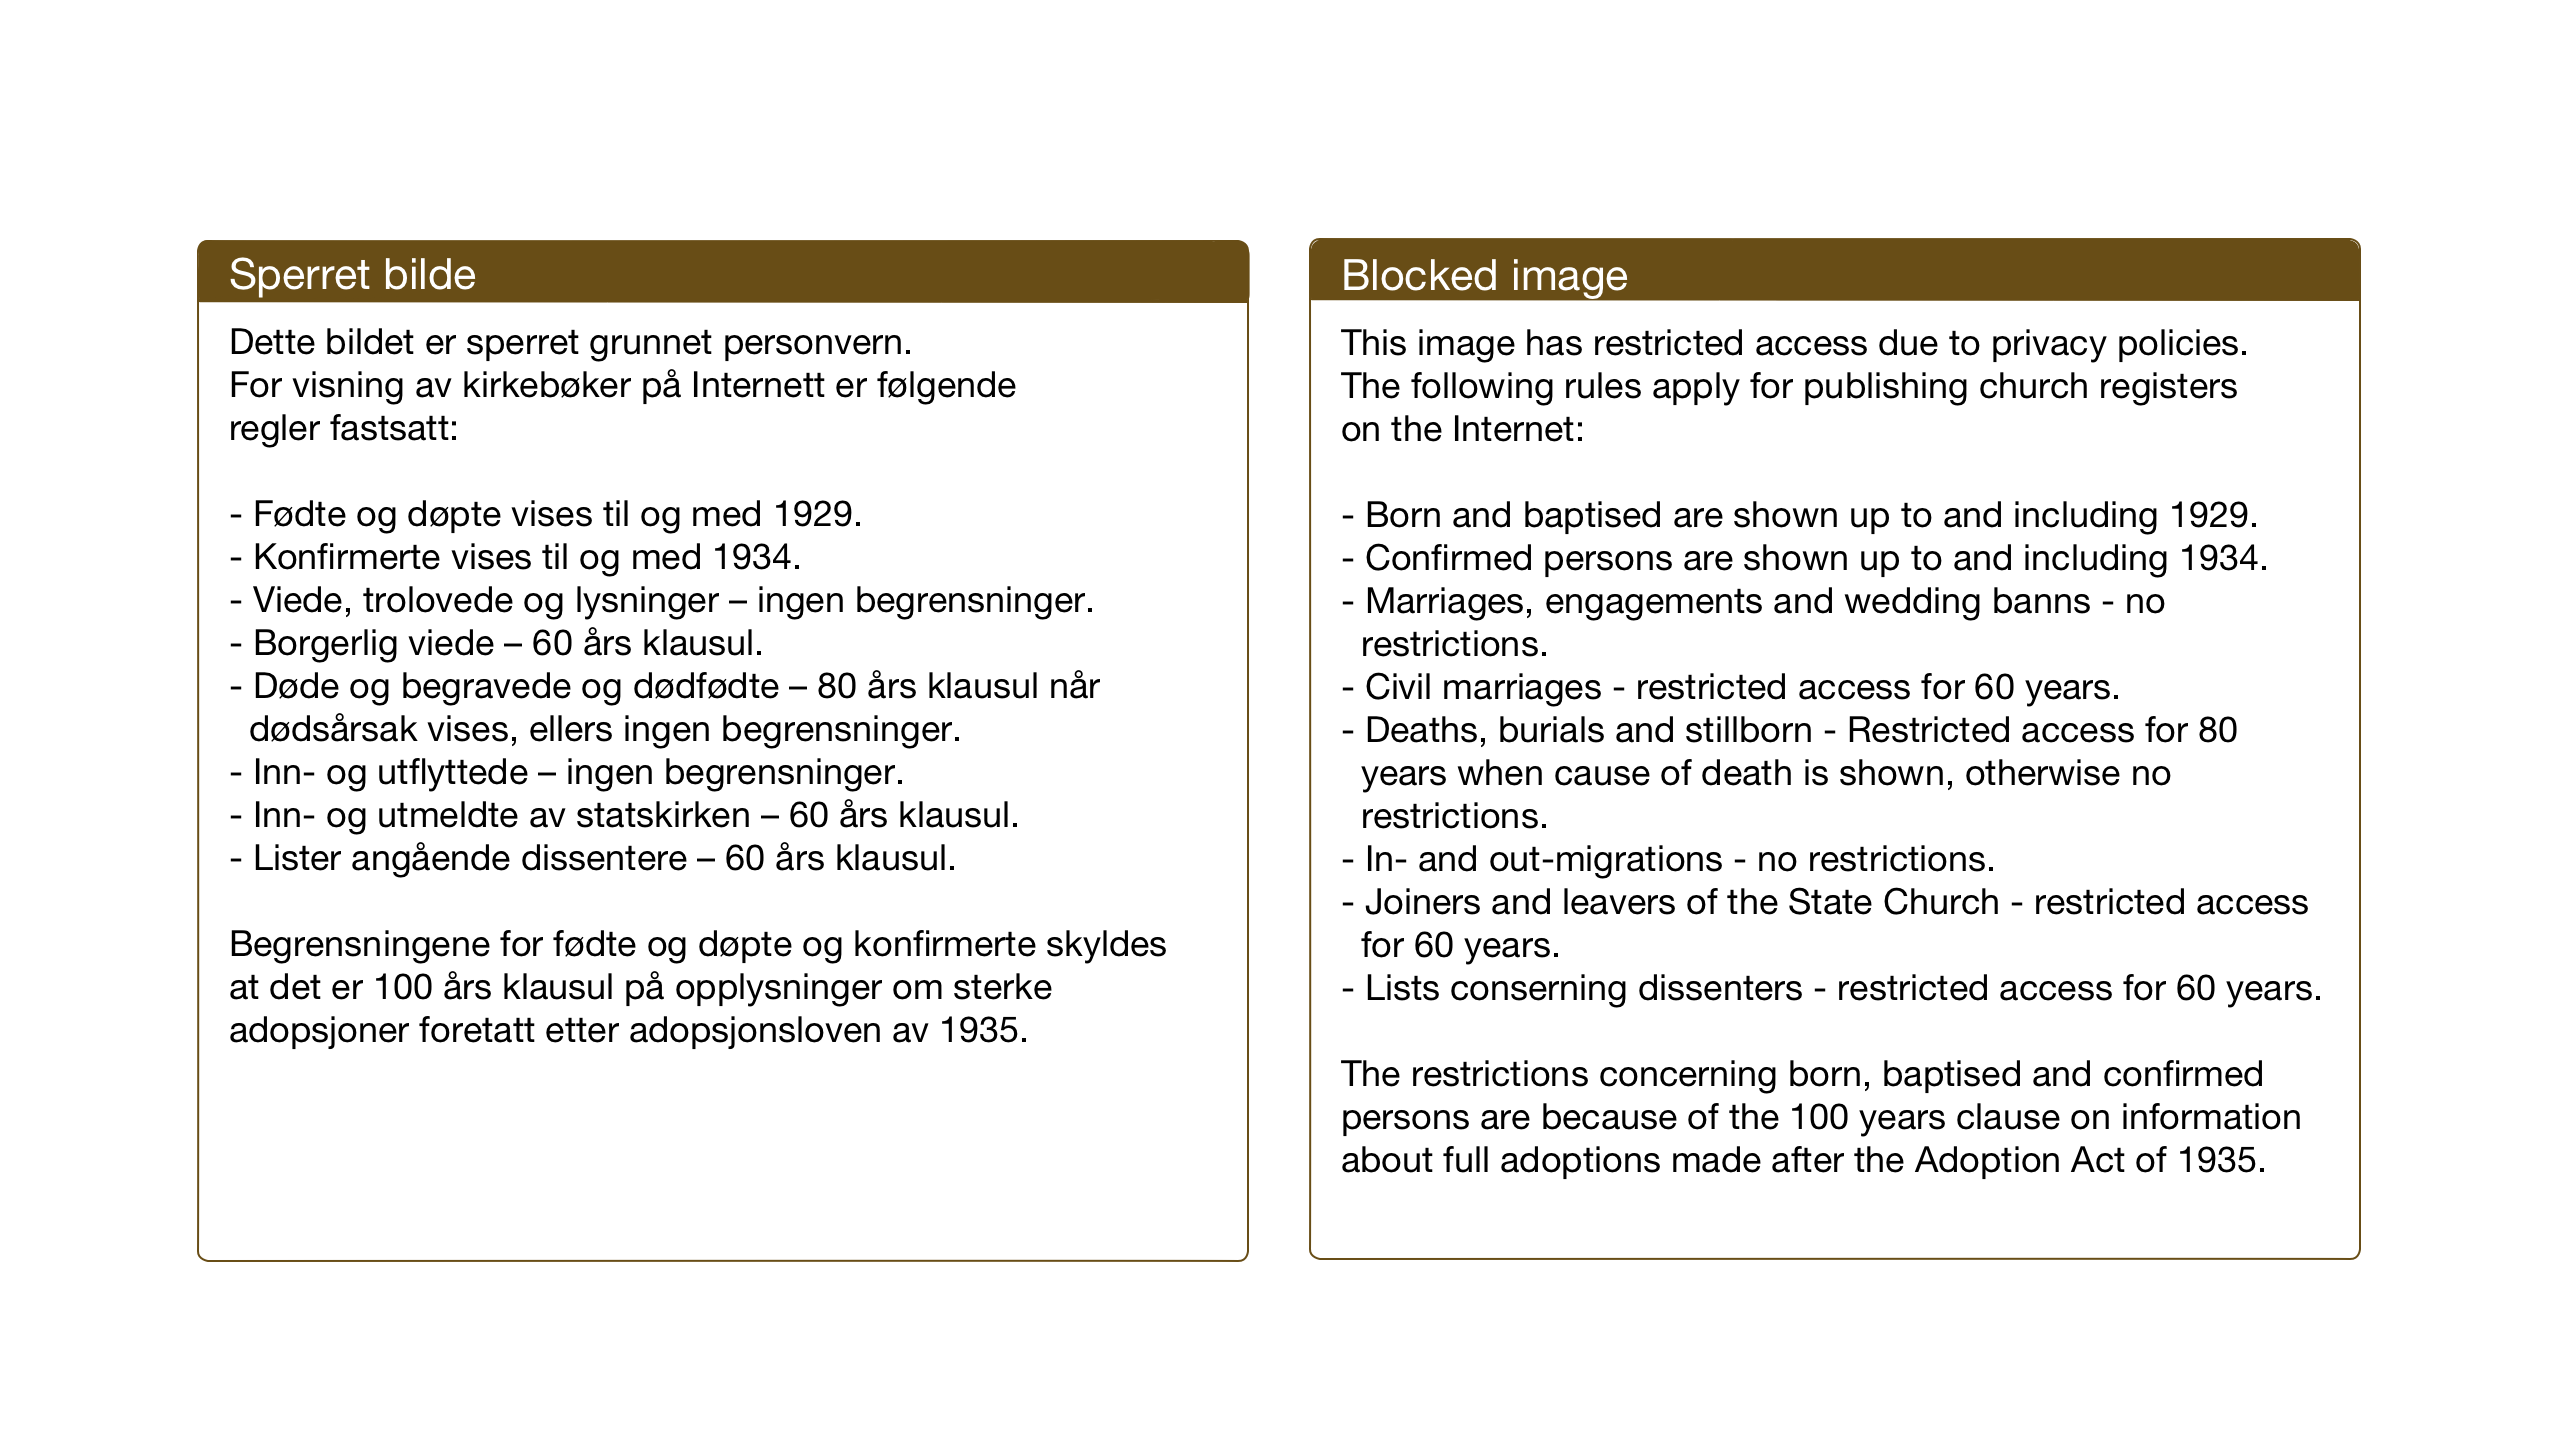 SAH, Vardal prestekontor, H/Ha/Haa/L0018: Ministerialbok nr. 18, 1930-1945, s. 144